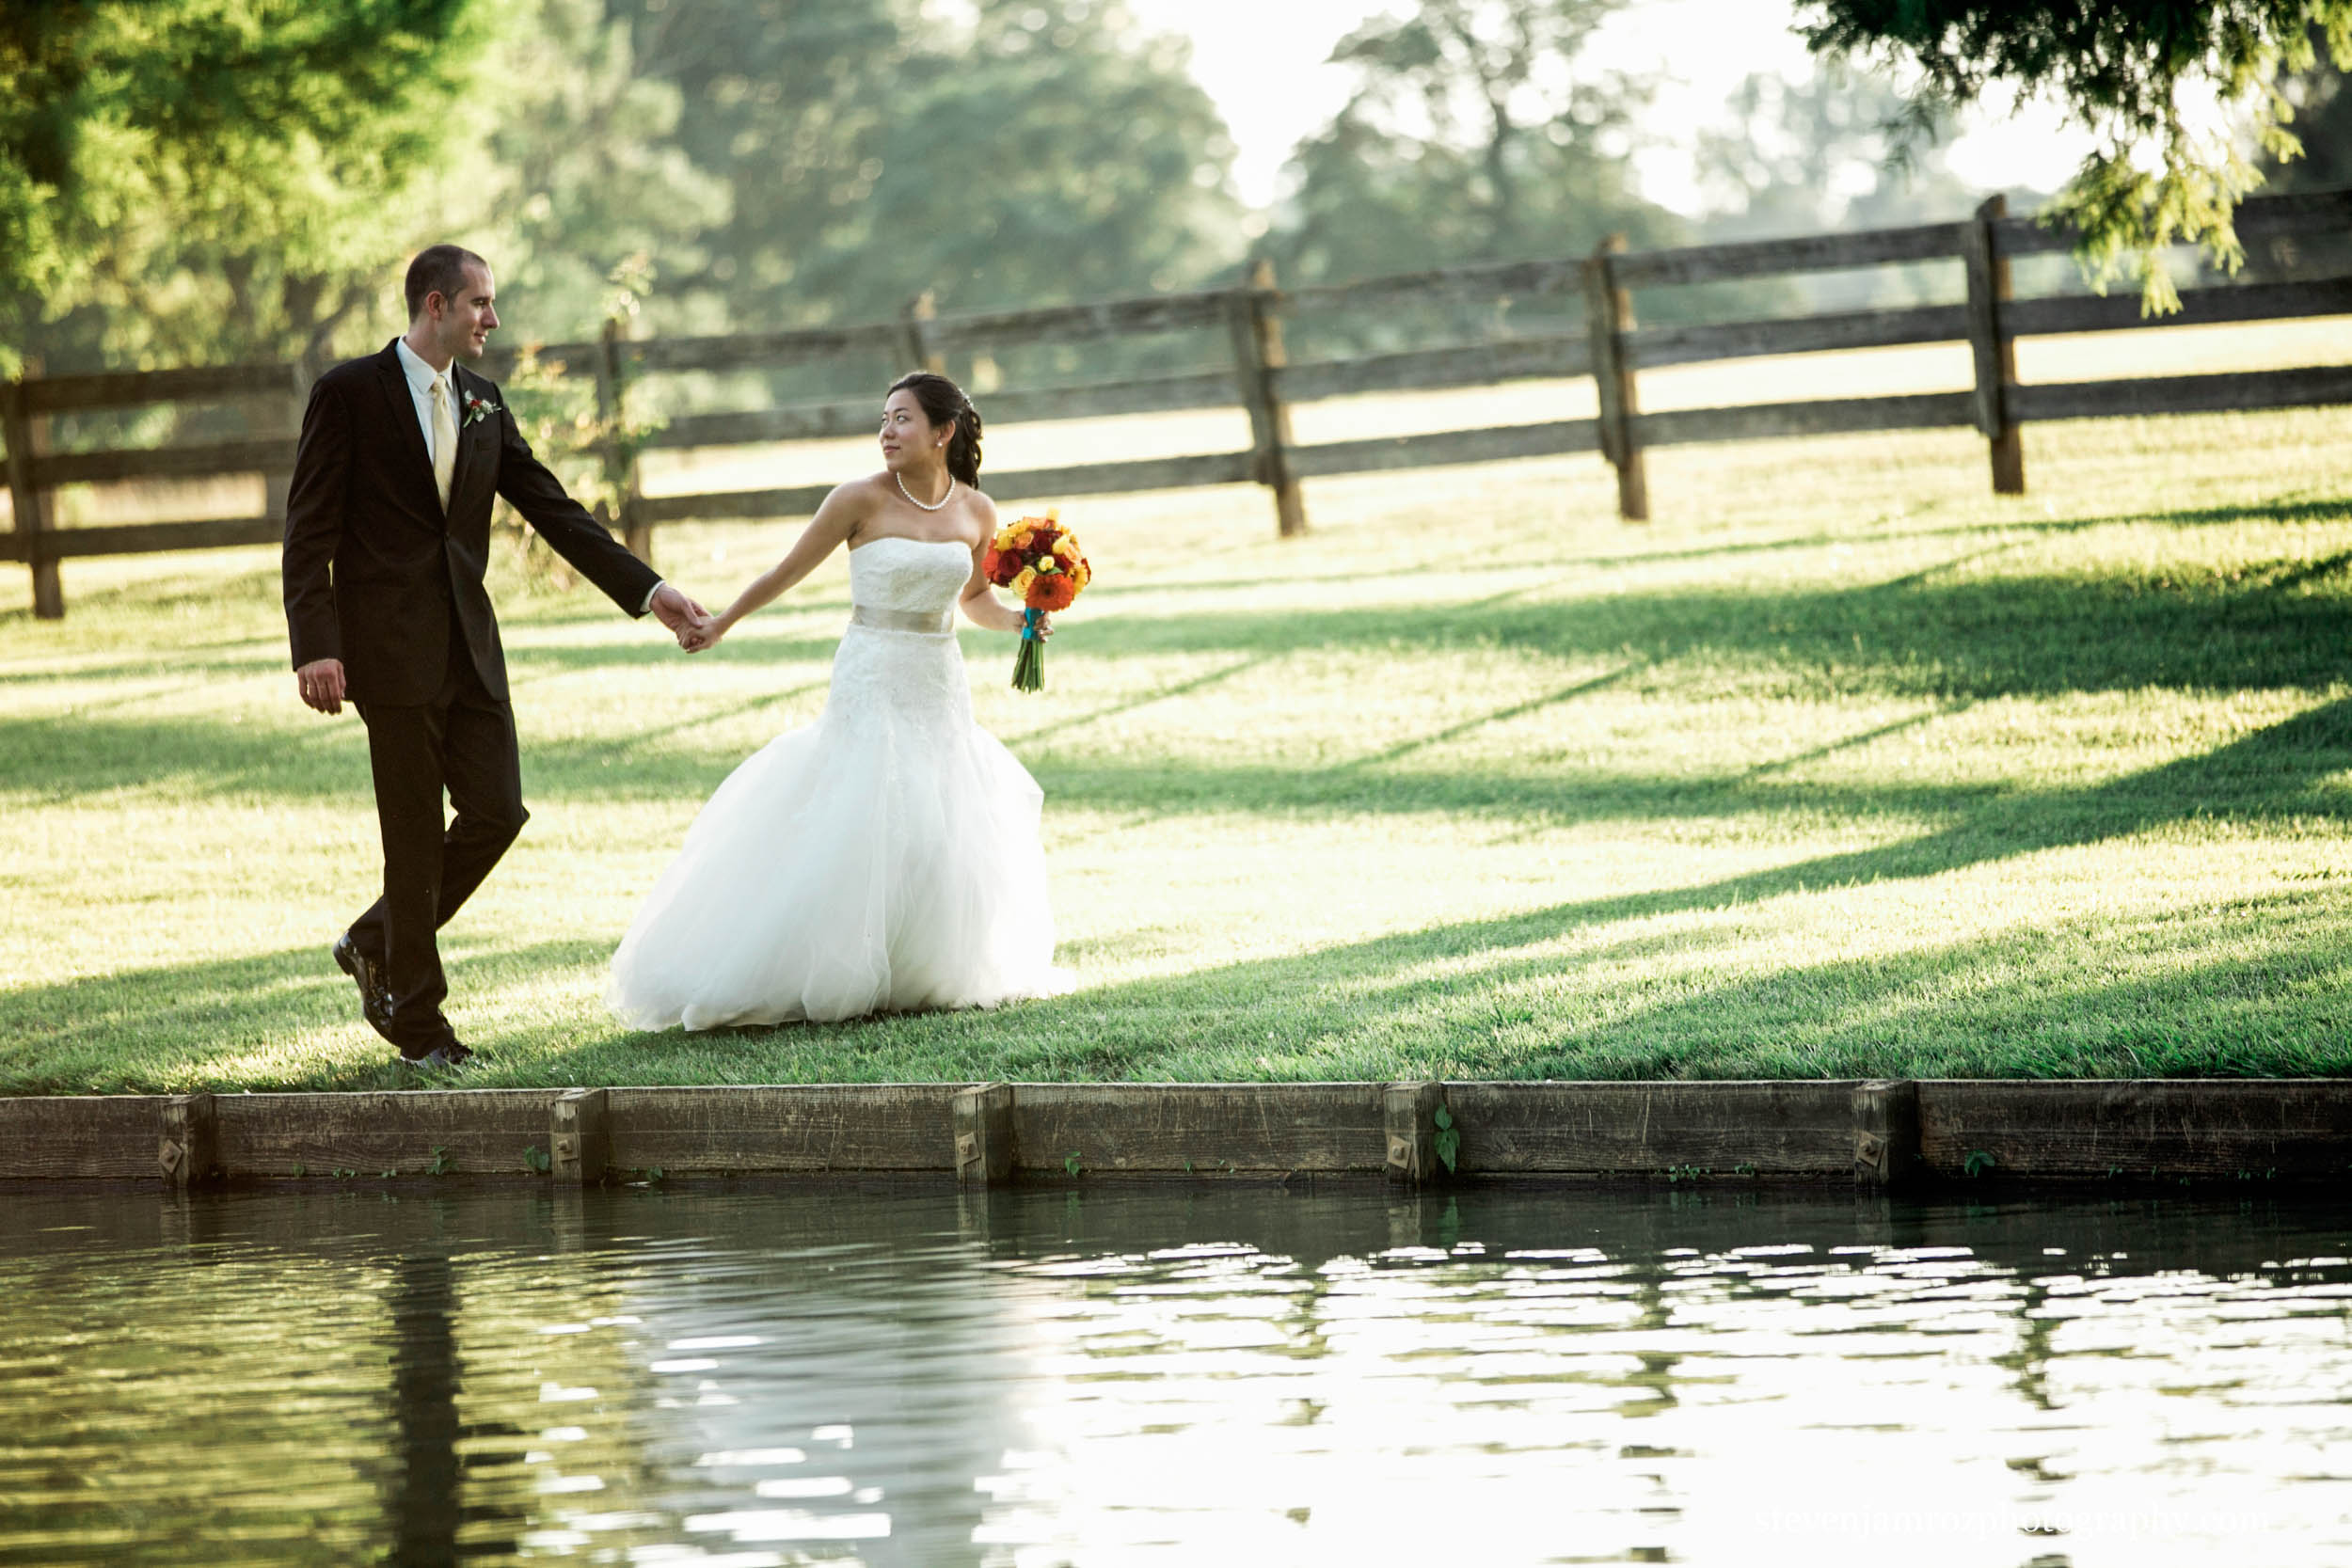 lake-rose-hill-plantation-wedding-couple-steven-jamroz-photography-0182.jpg